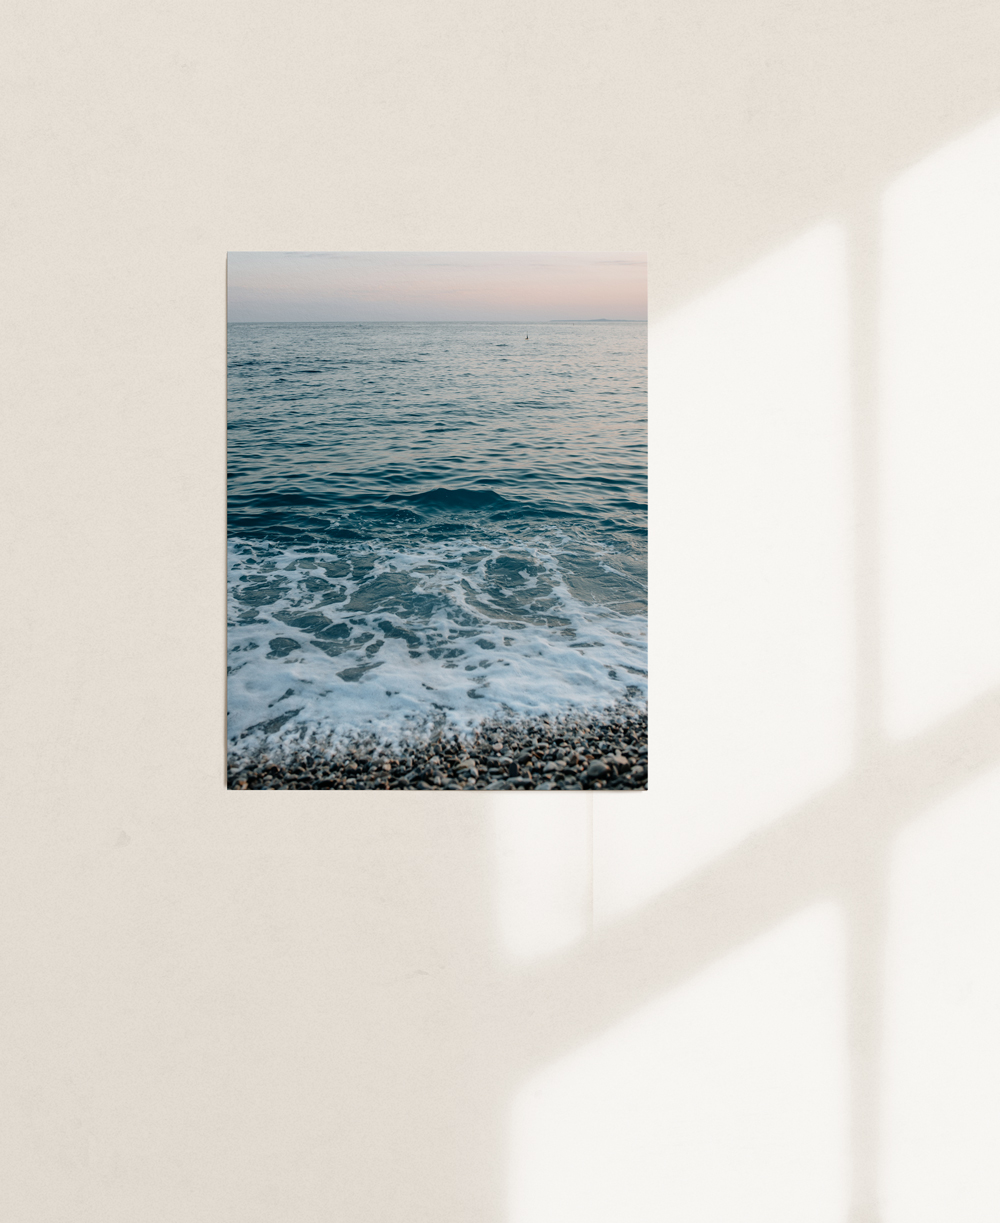 nicischwab-prints-02-005